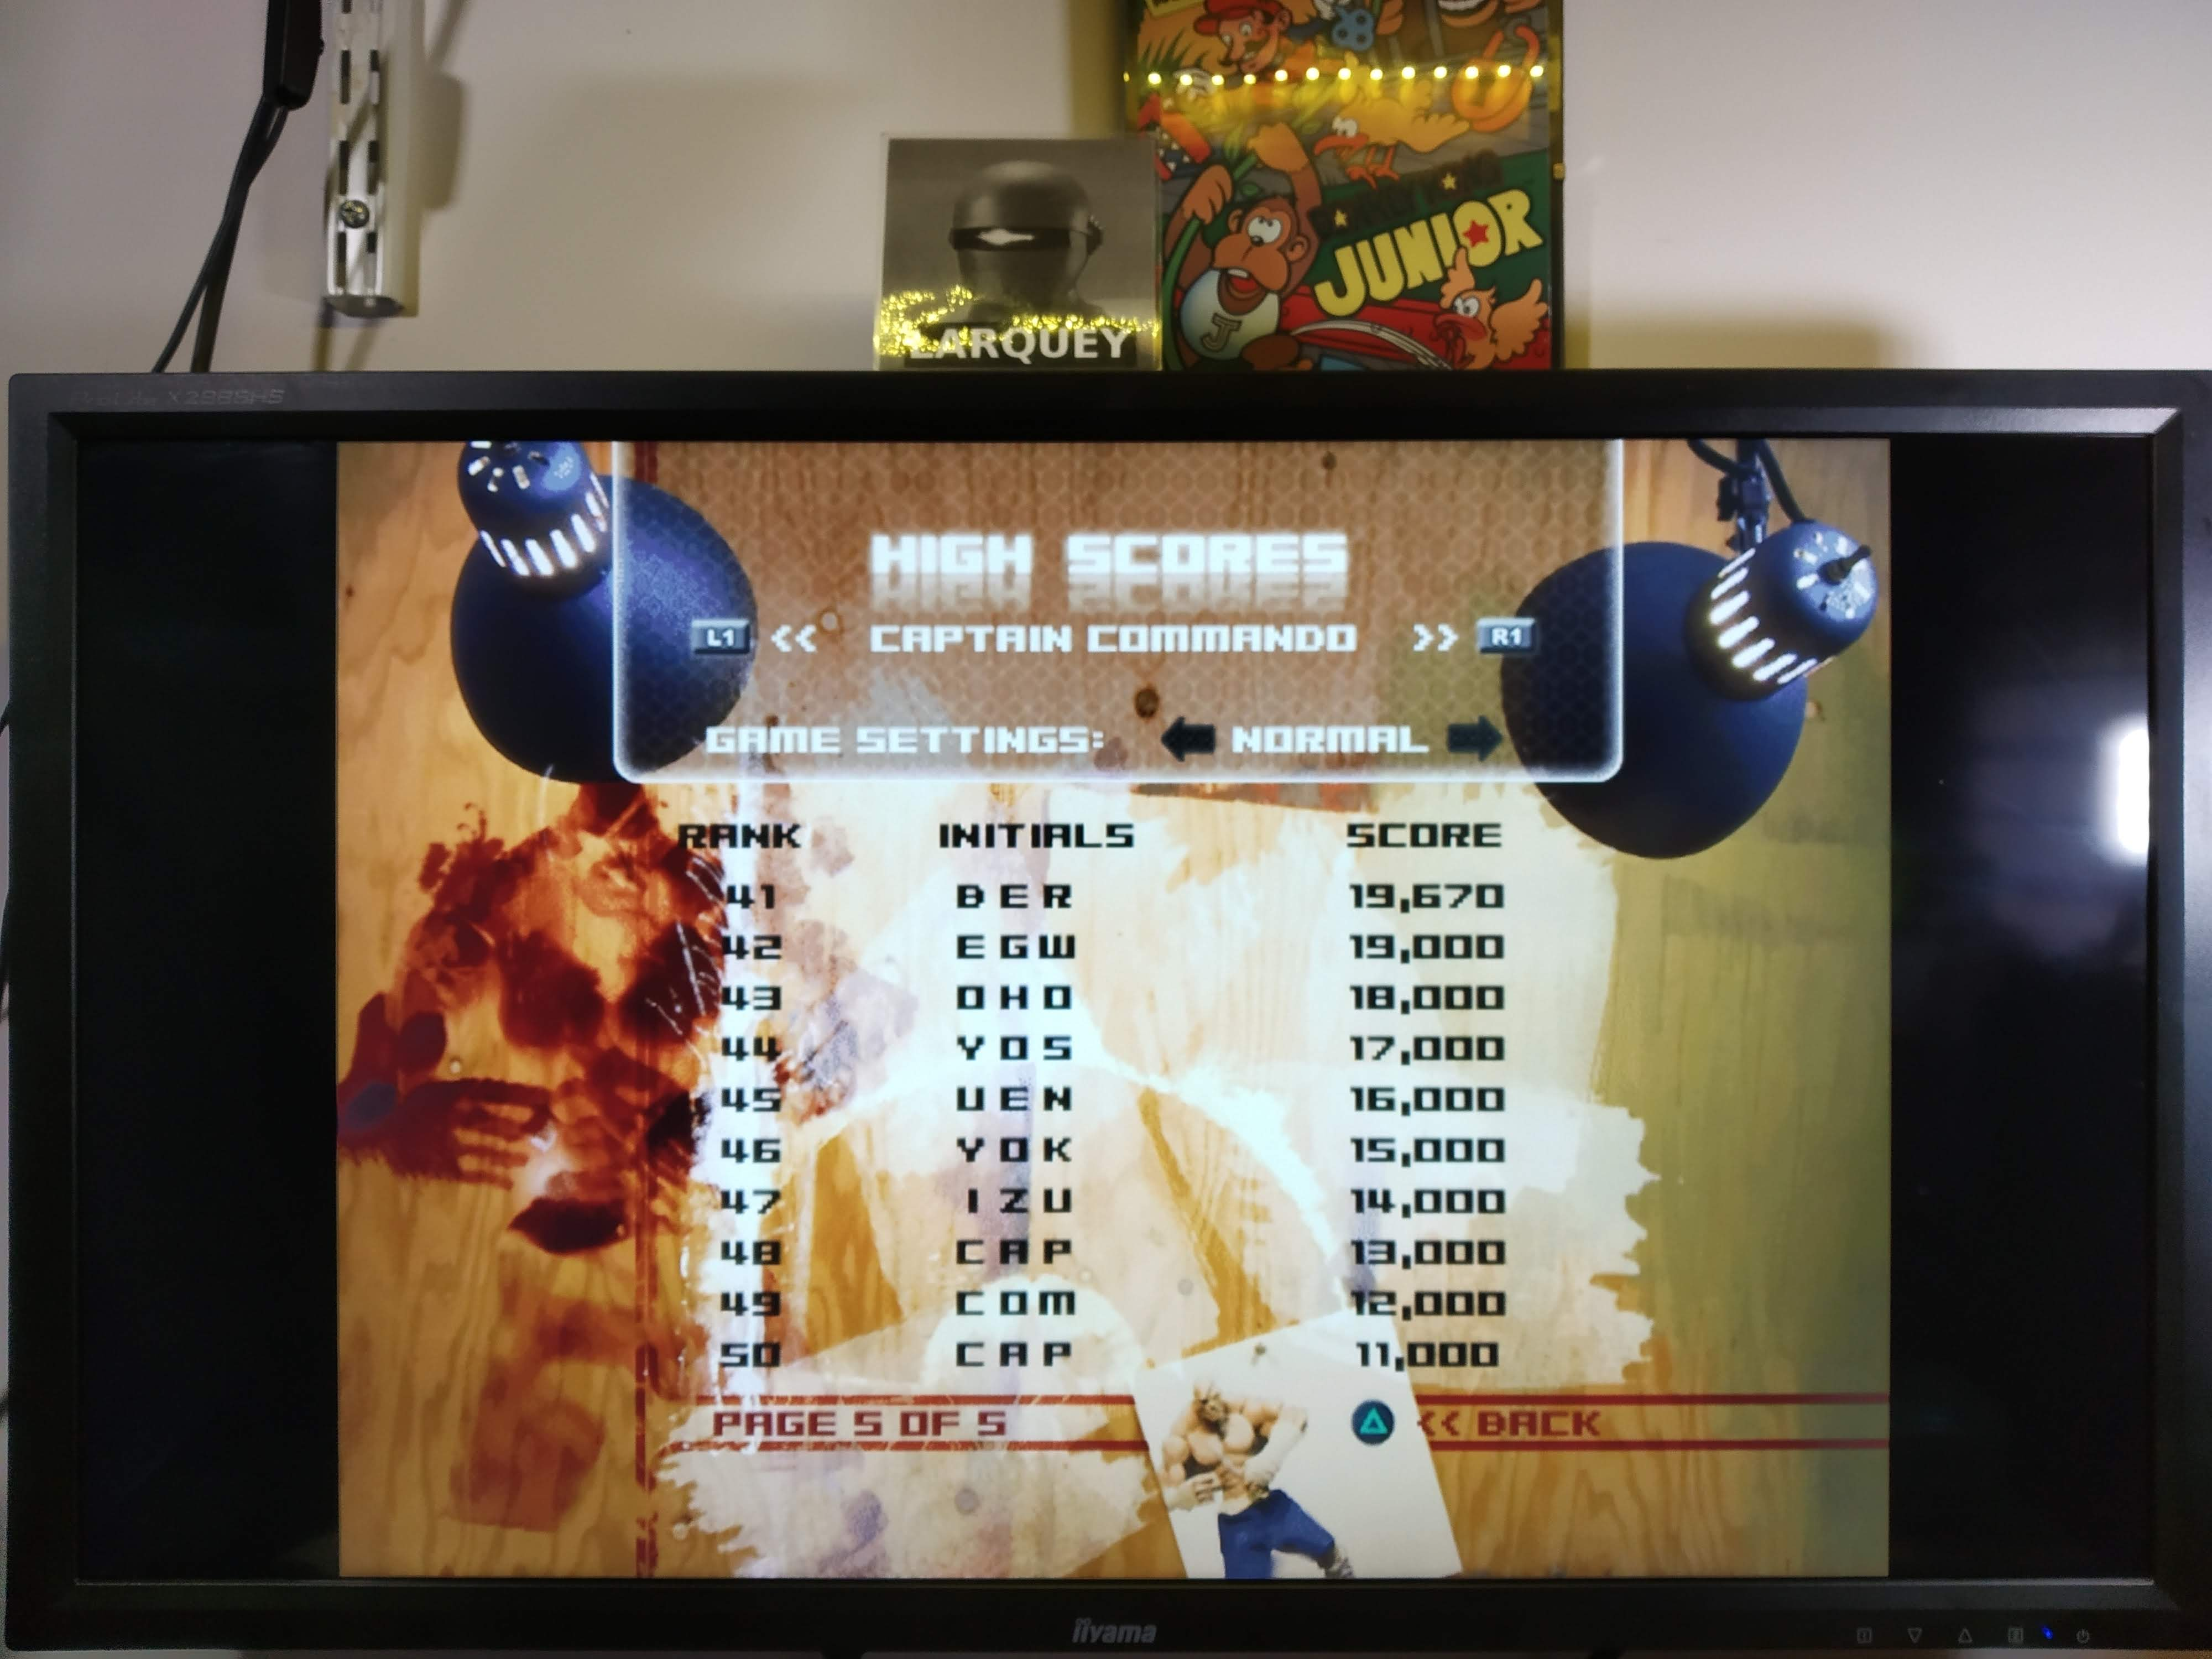 Larquey: Capcom Classics Vol. 2: Captain Commando [Normal] (Playstation 2 Emulated) 19,670 points on 2020-08-01 13:45:12